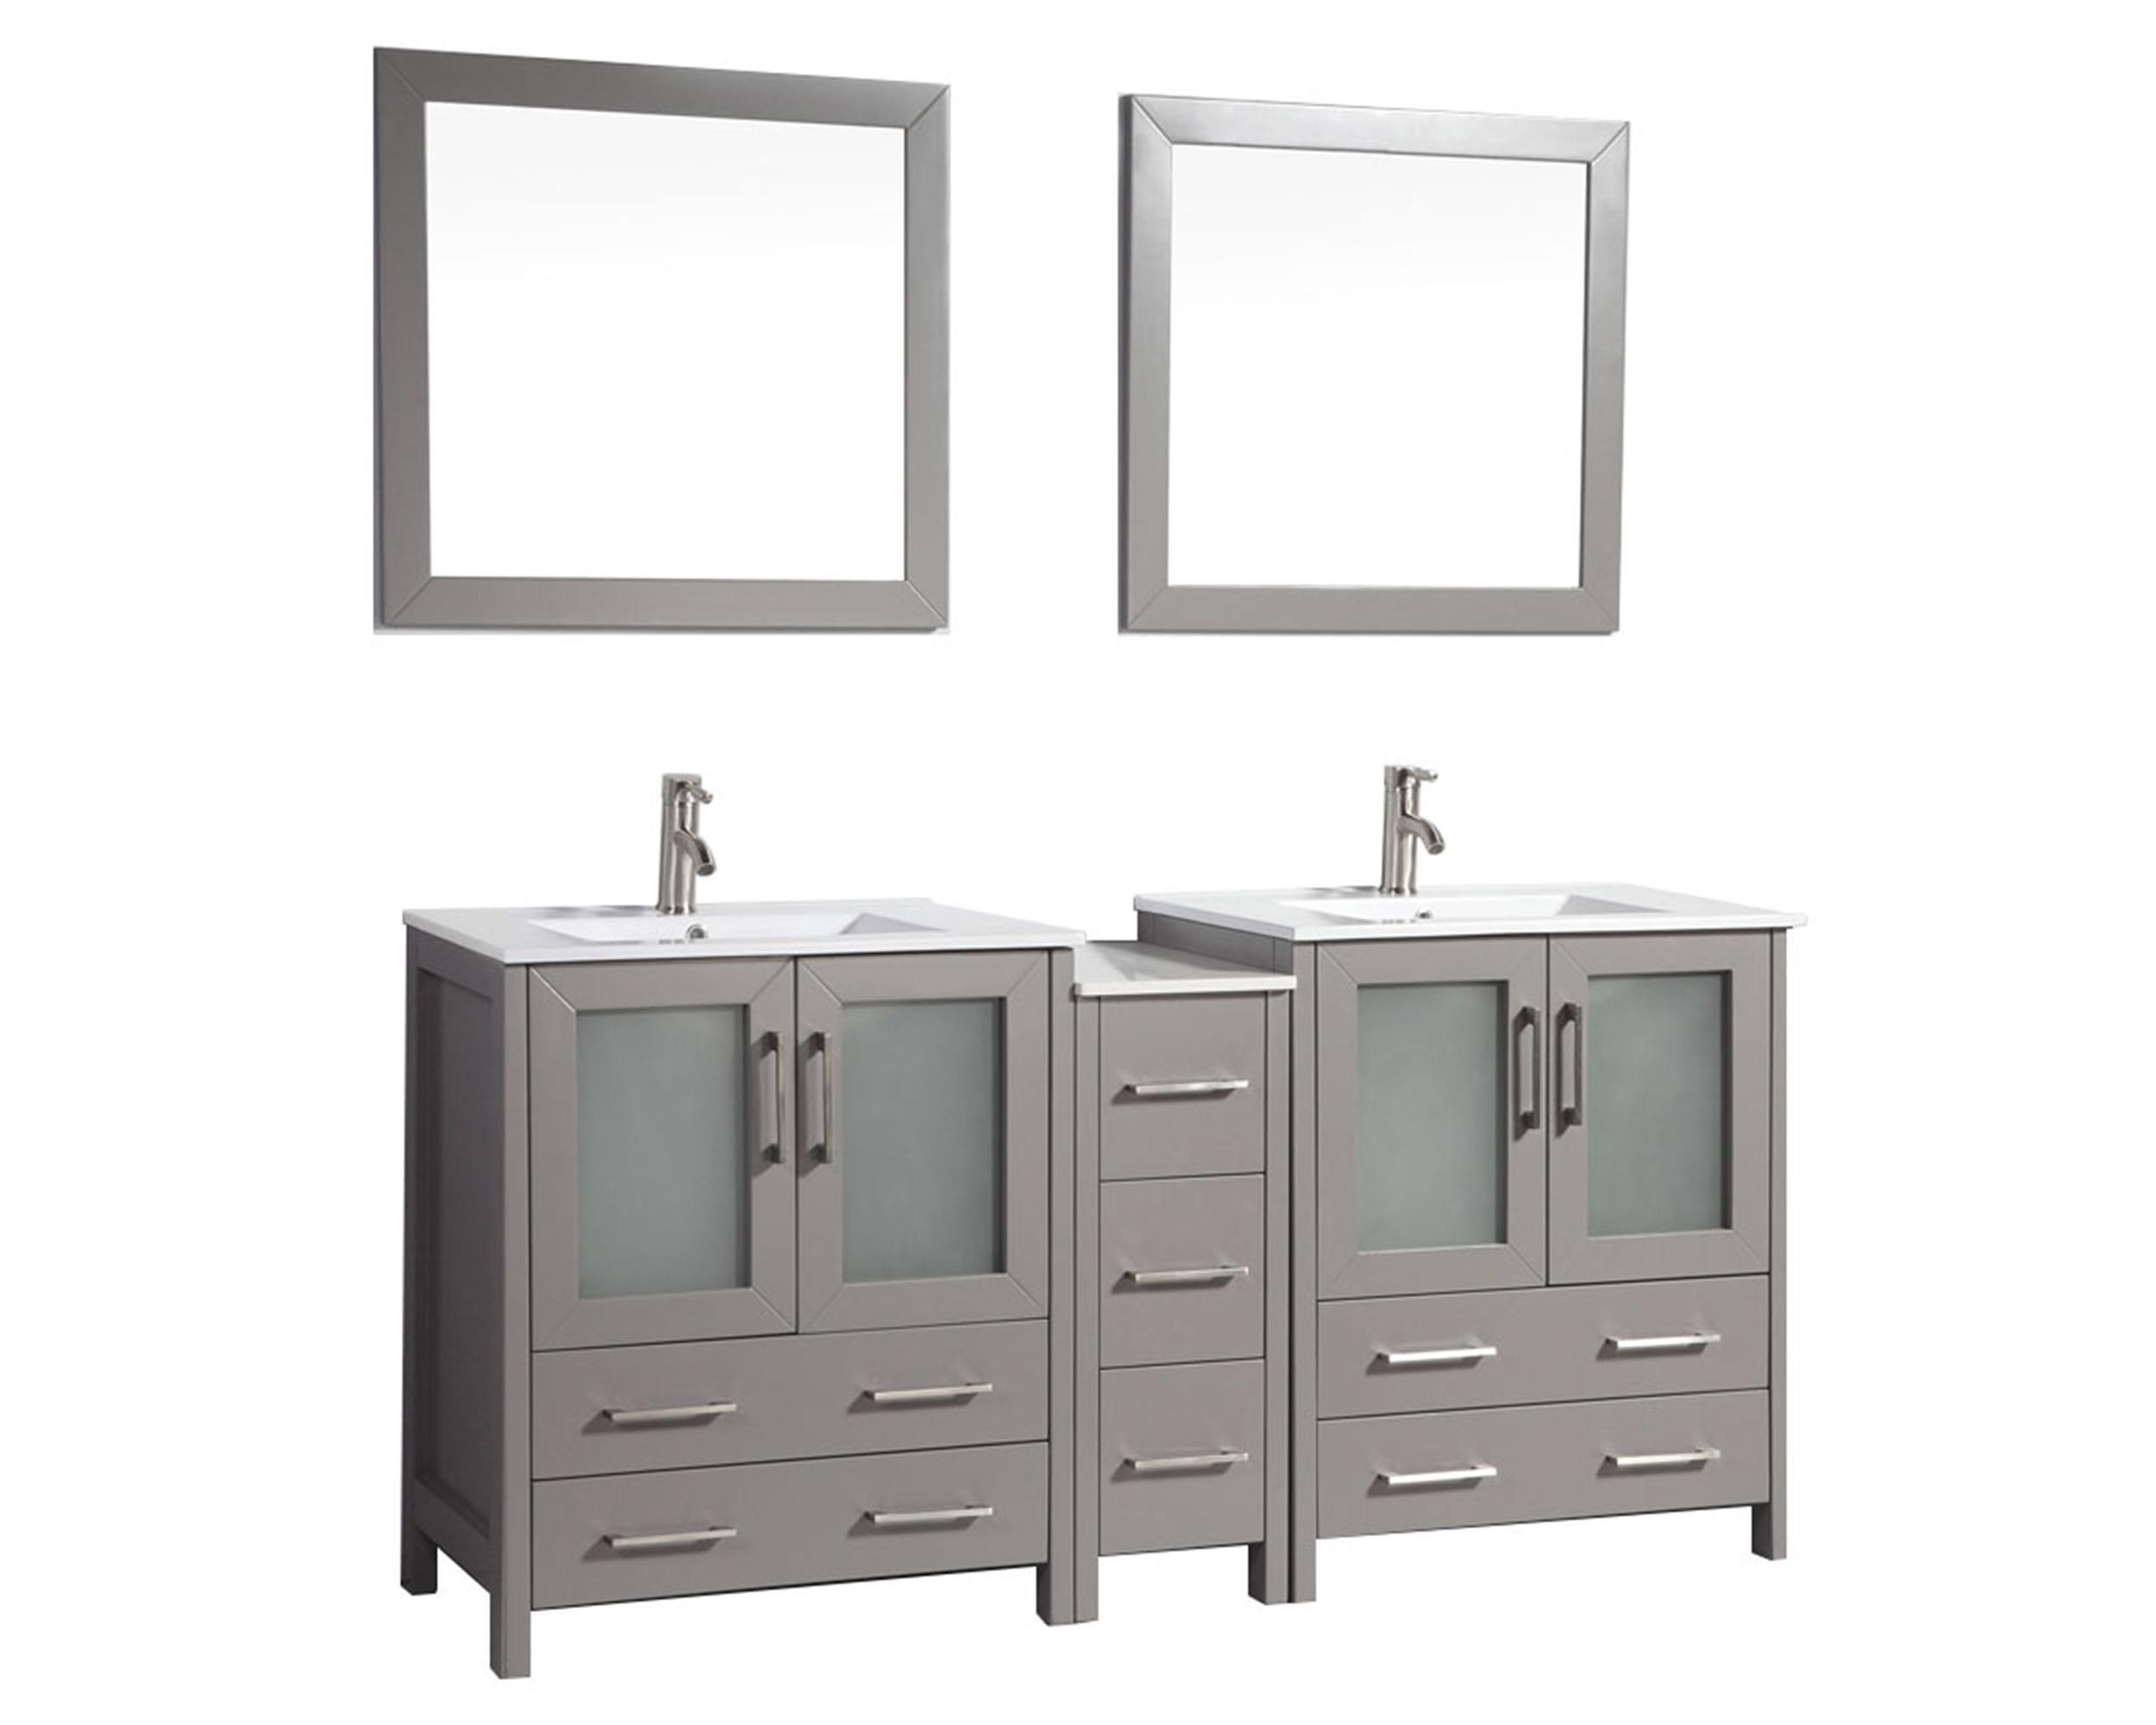 72 Inch Double Sink Bathroom Vanity Top.Vanity Art 72 Inch Double Sink Bathroom Vanity Set With Ceramic Vanity Top